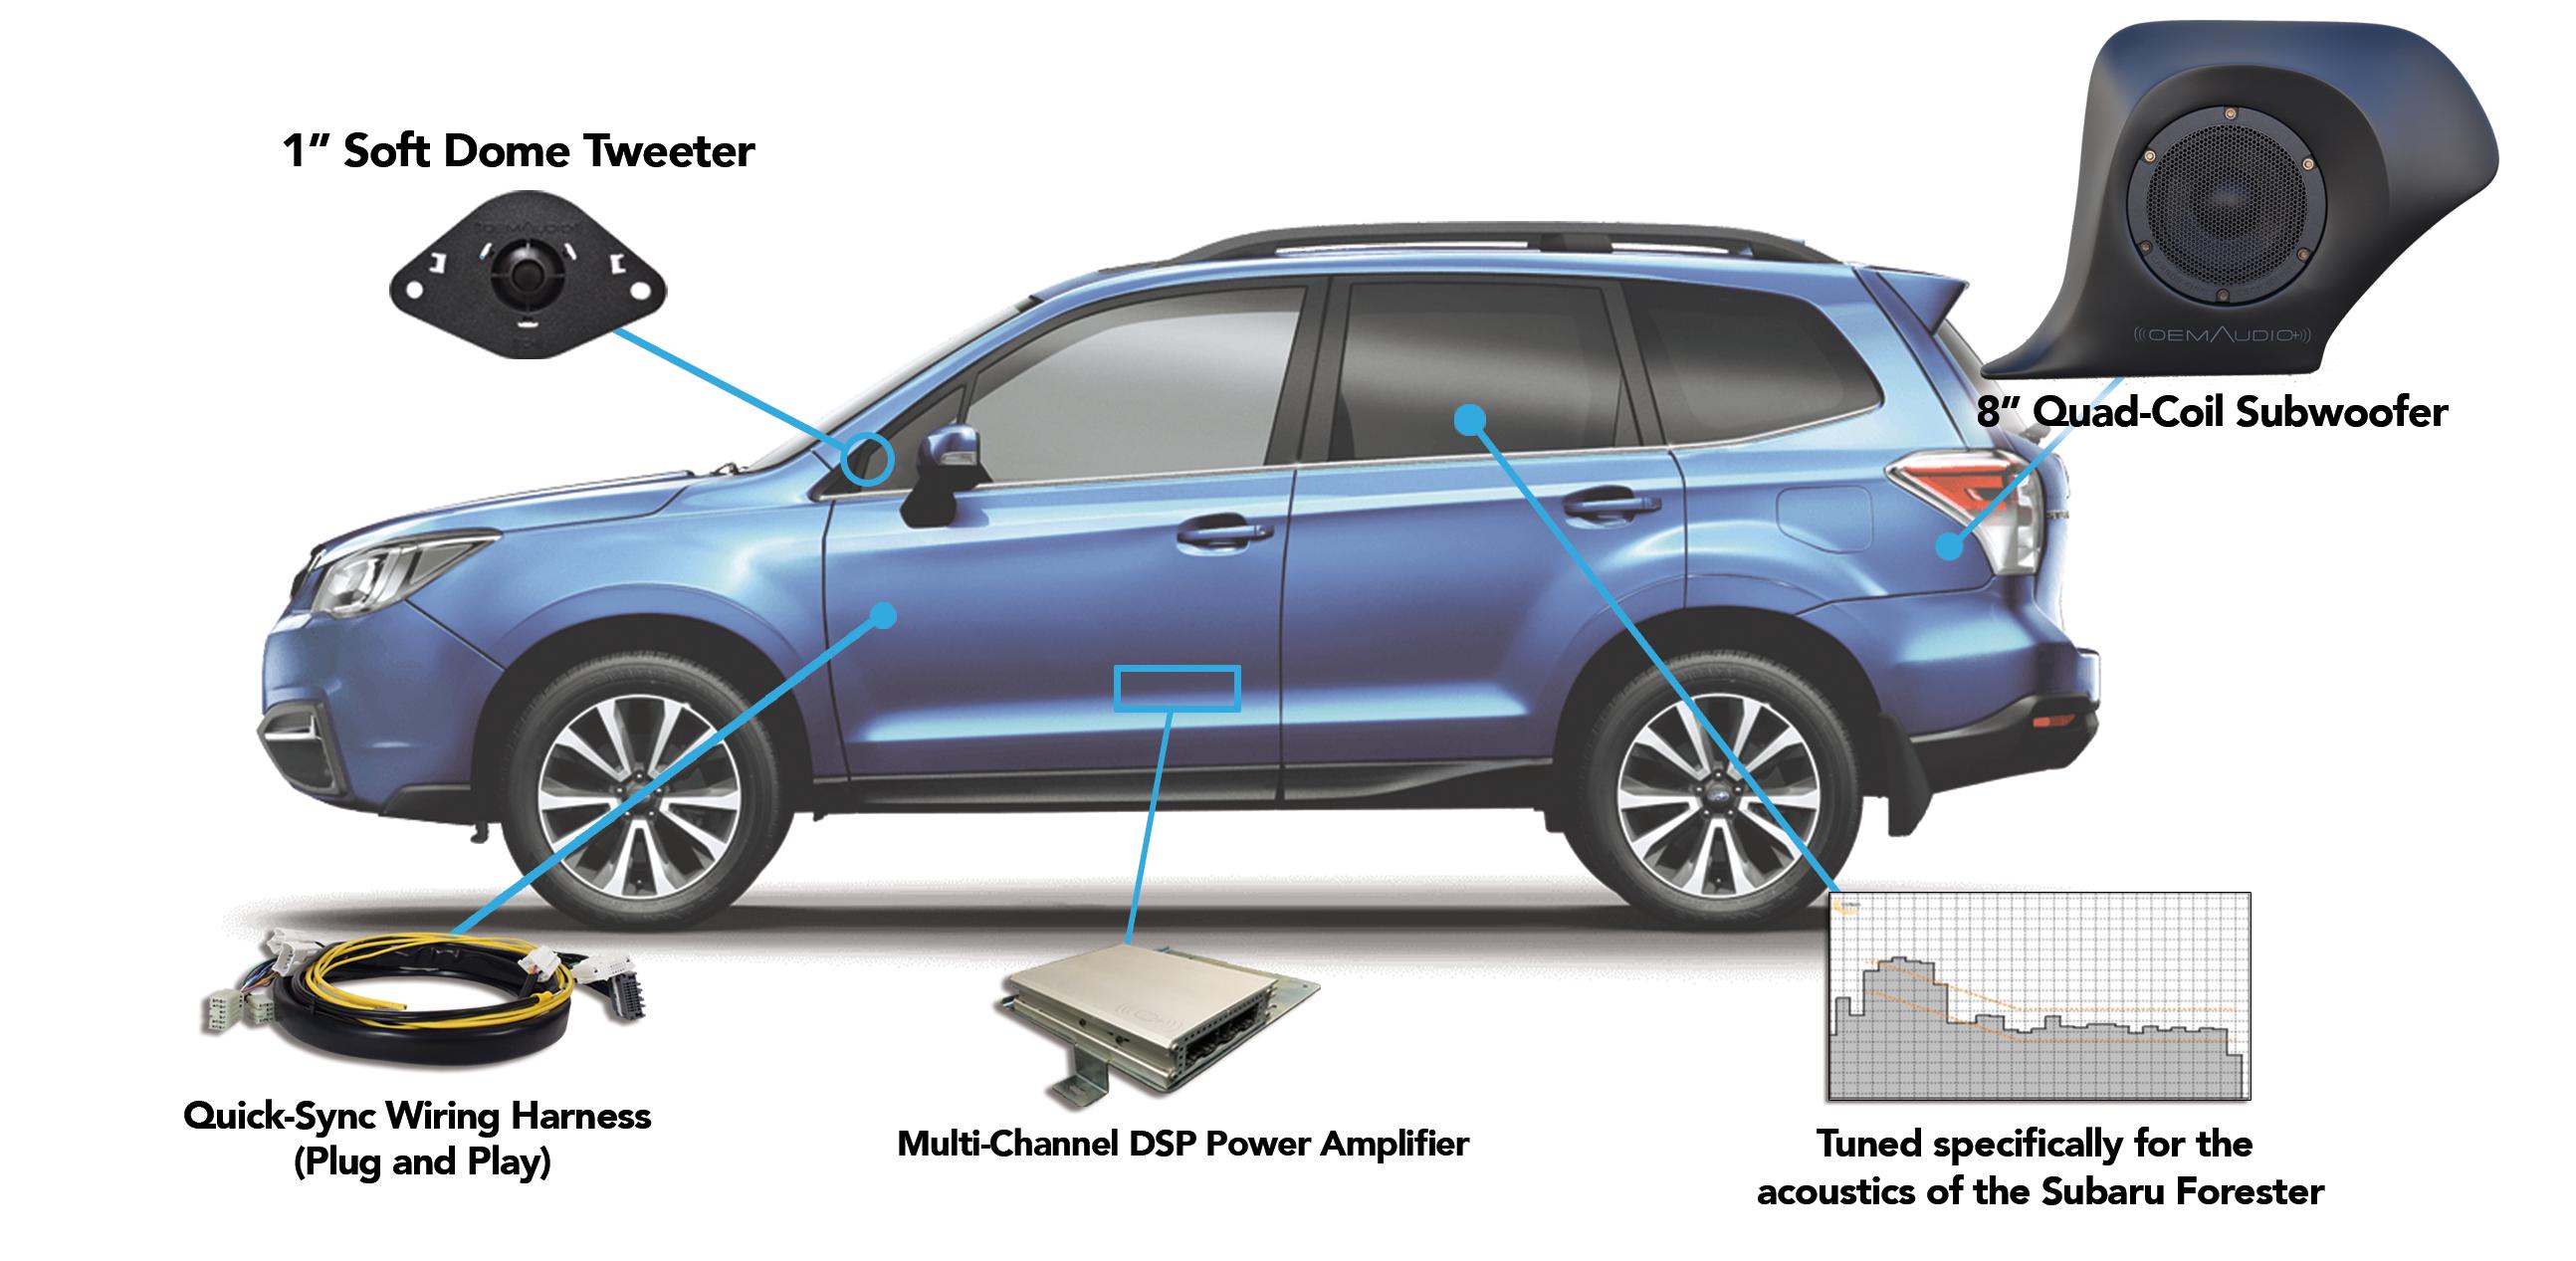 Subaru Forester Subwoofer Under Seat - Wiring Diagrams on subaru speaker wire harness, subaru remote starter installation, subaru radio harness, subaru wiring harness,